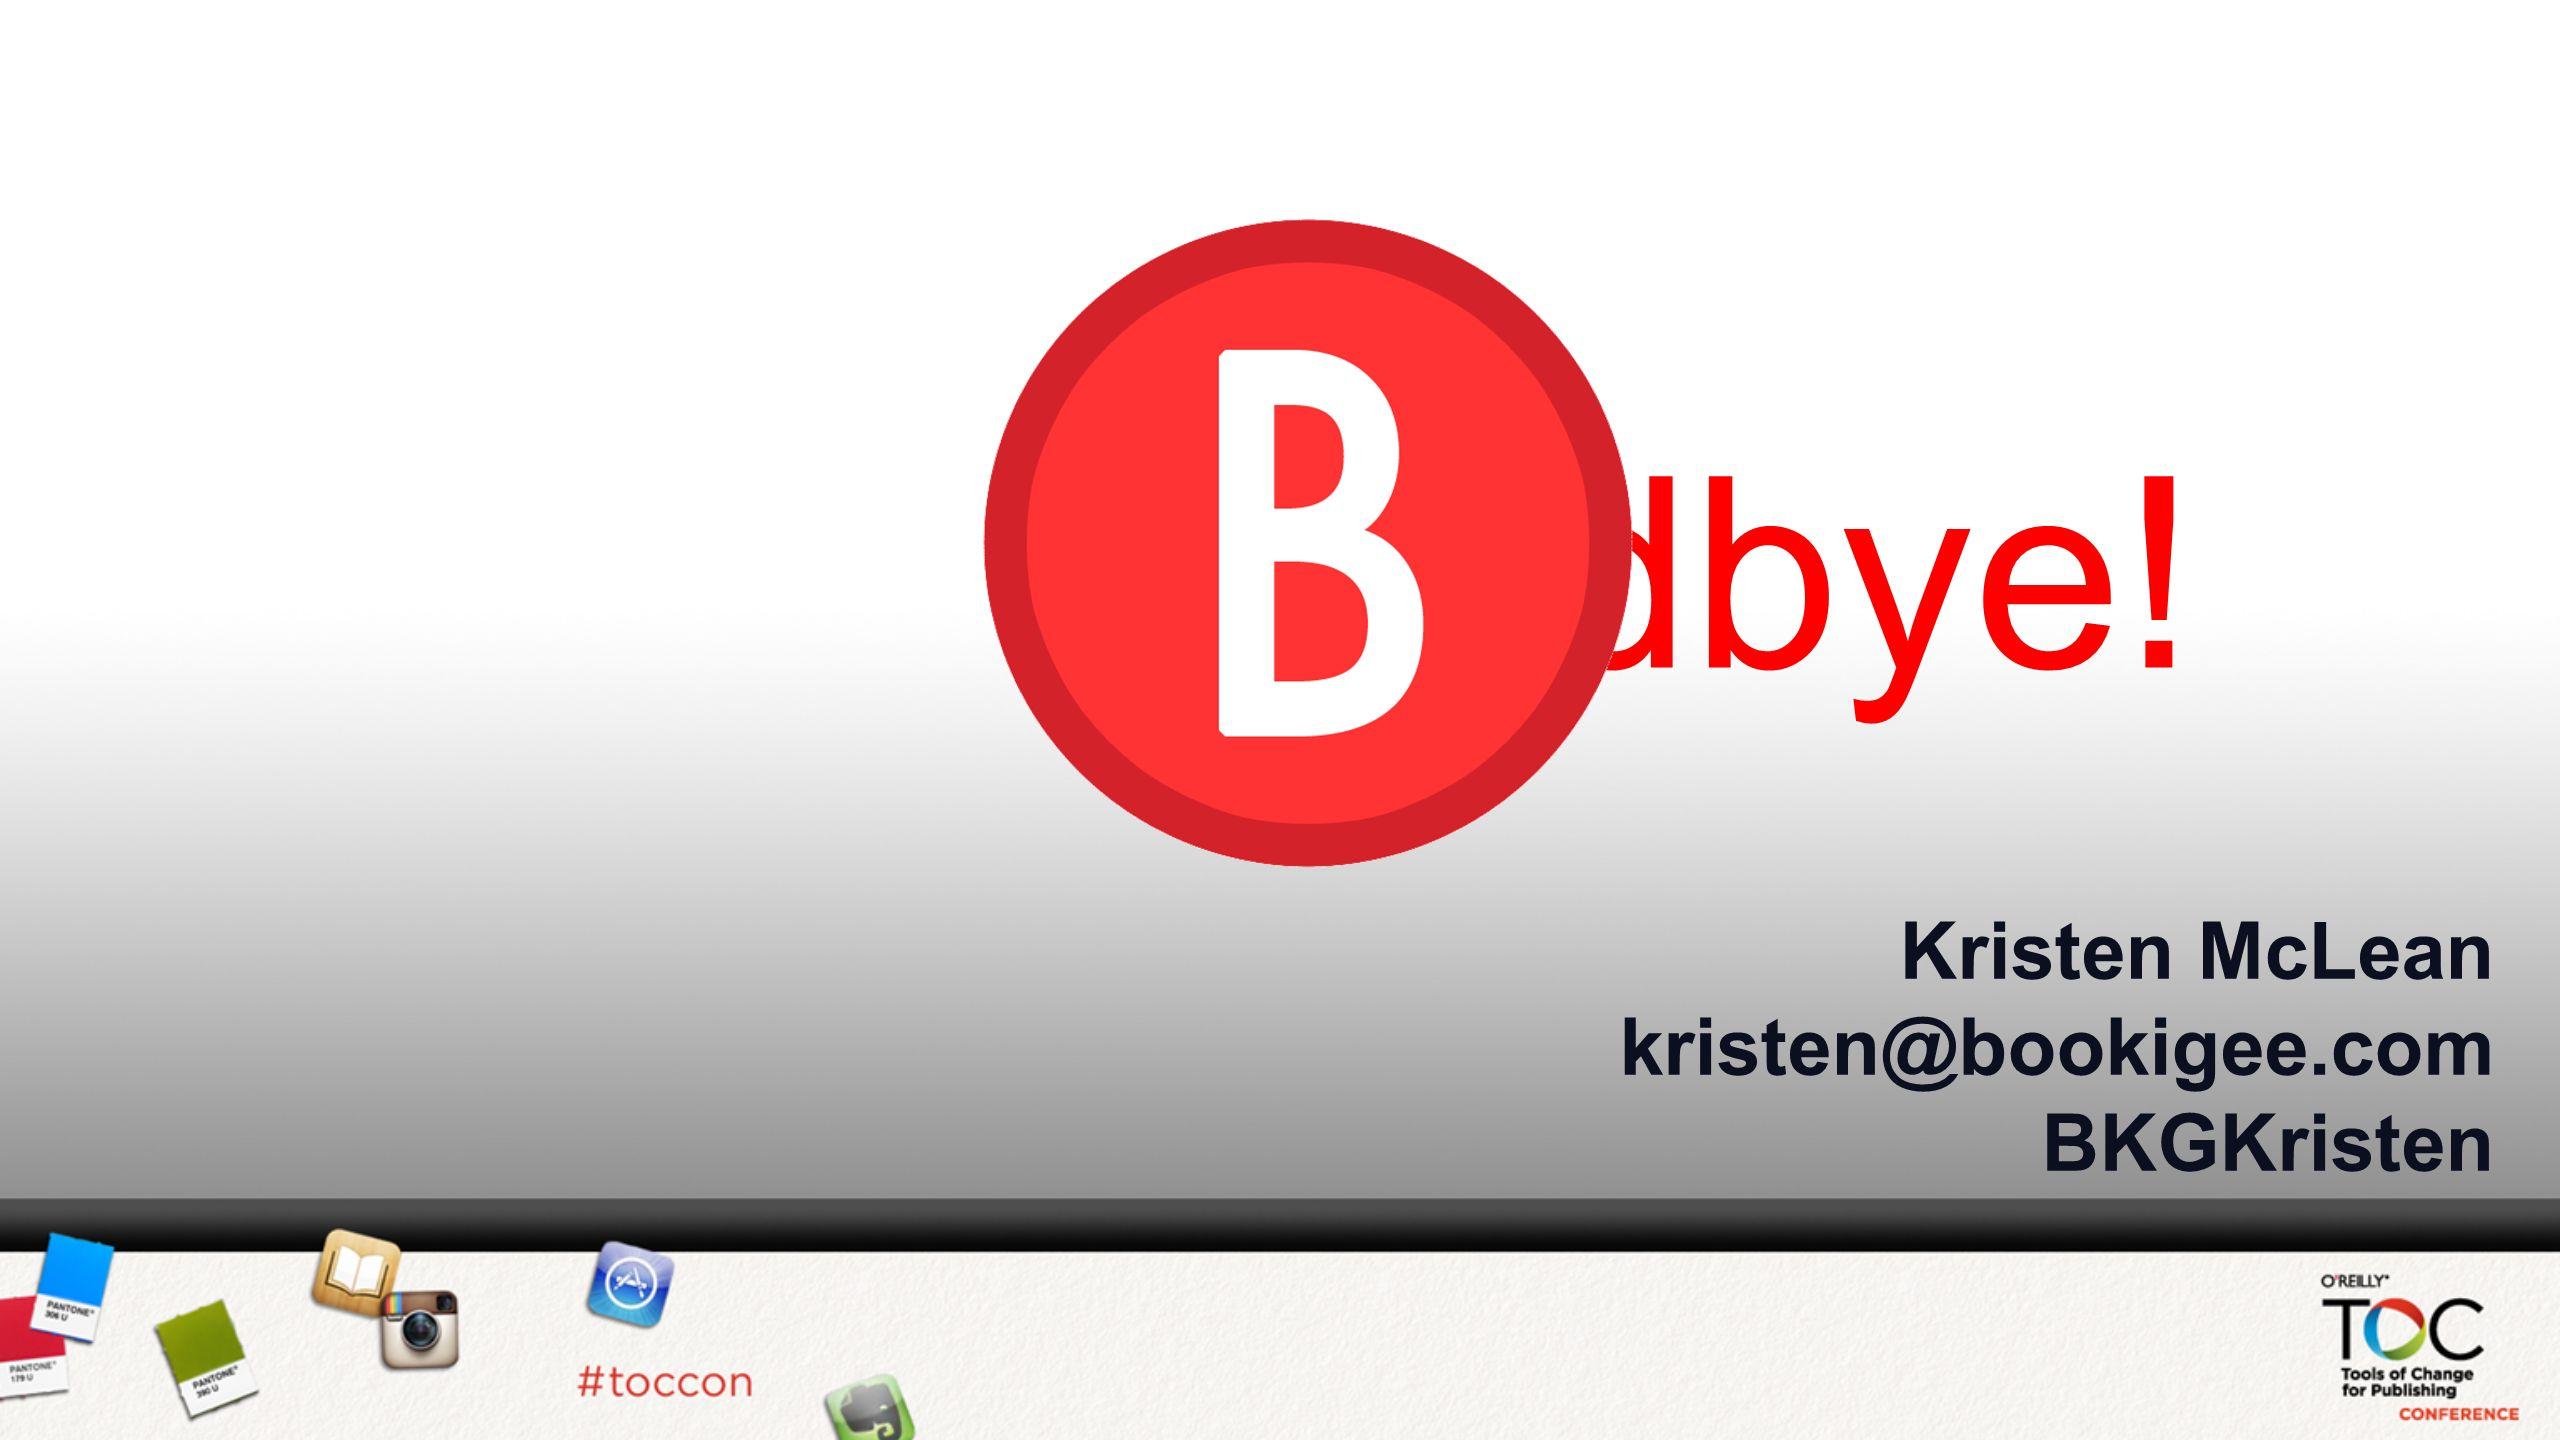 Kristen McLean kristen@bookigee.com BKGKristen Goodbye!